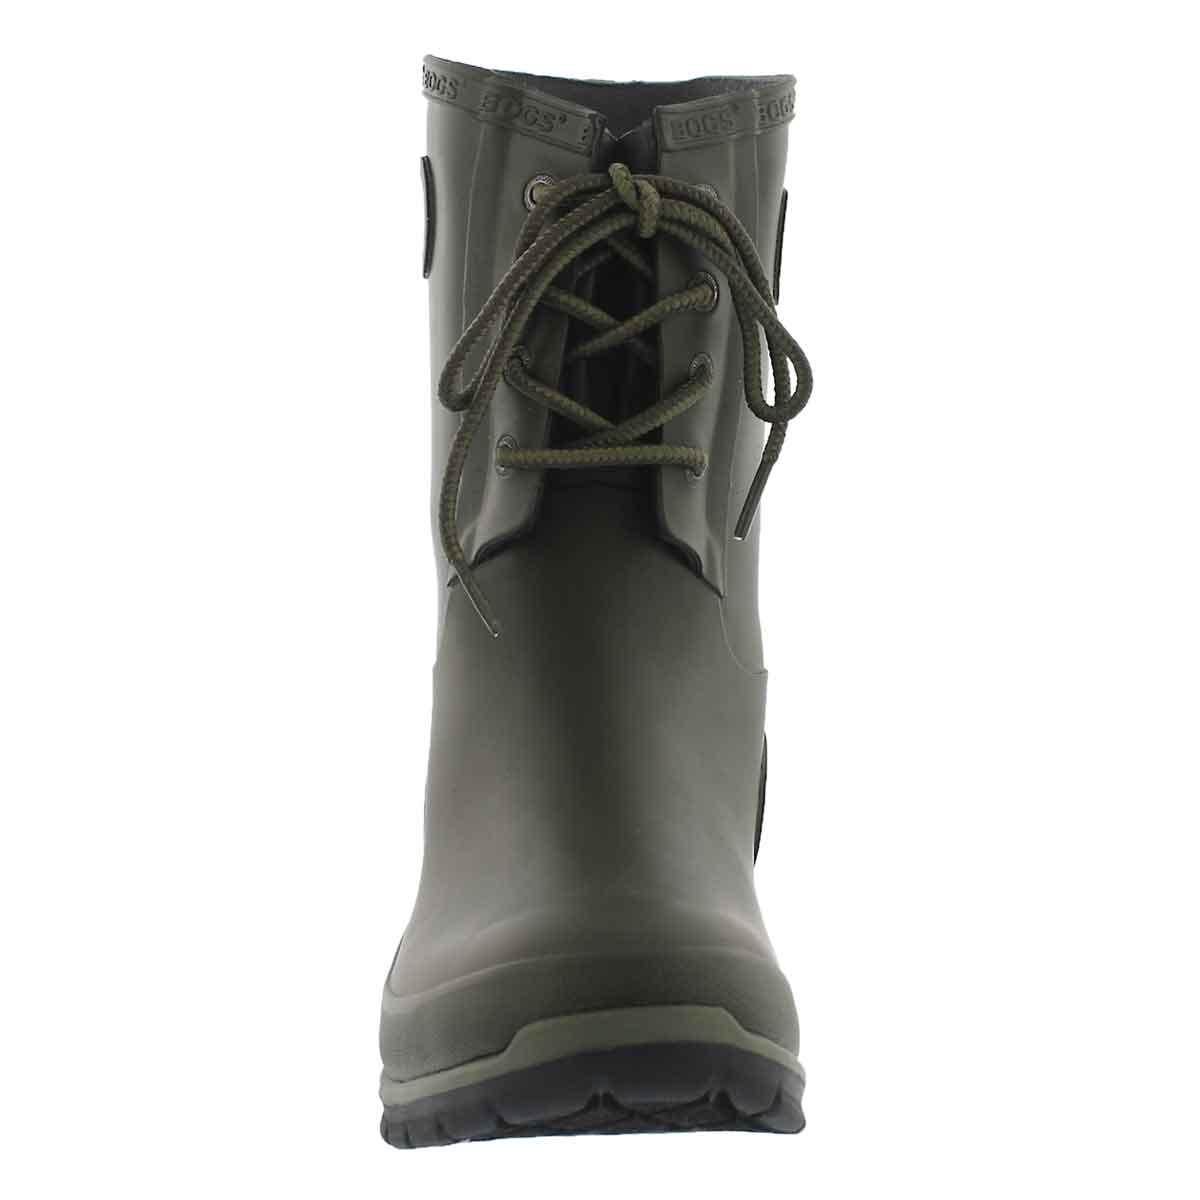 Lds Amanda 4-Eye drk grn wtpf rain boot